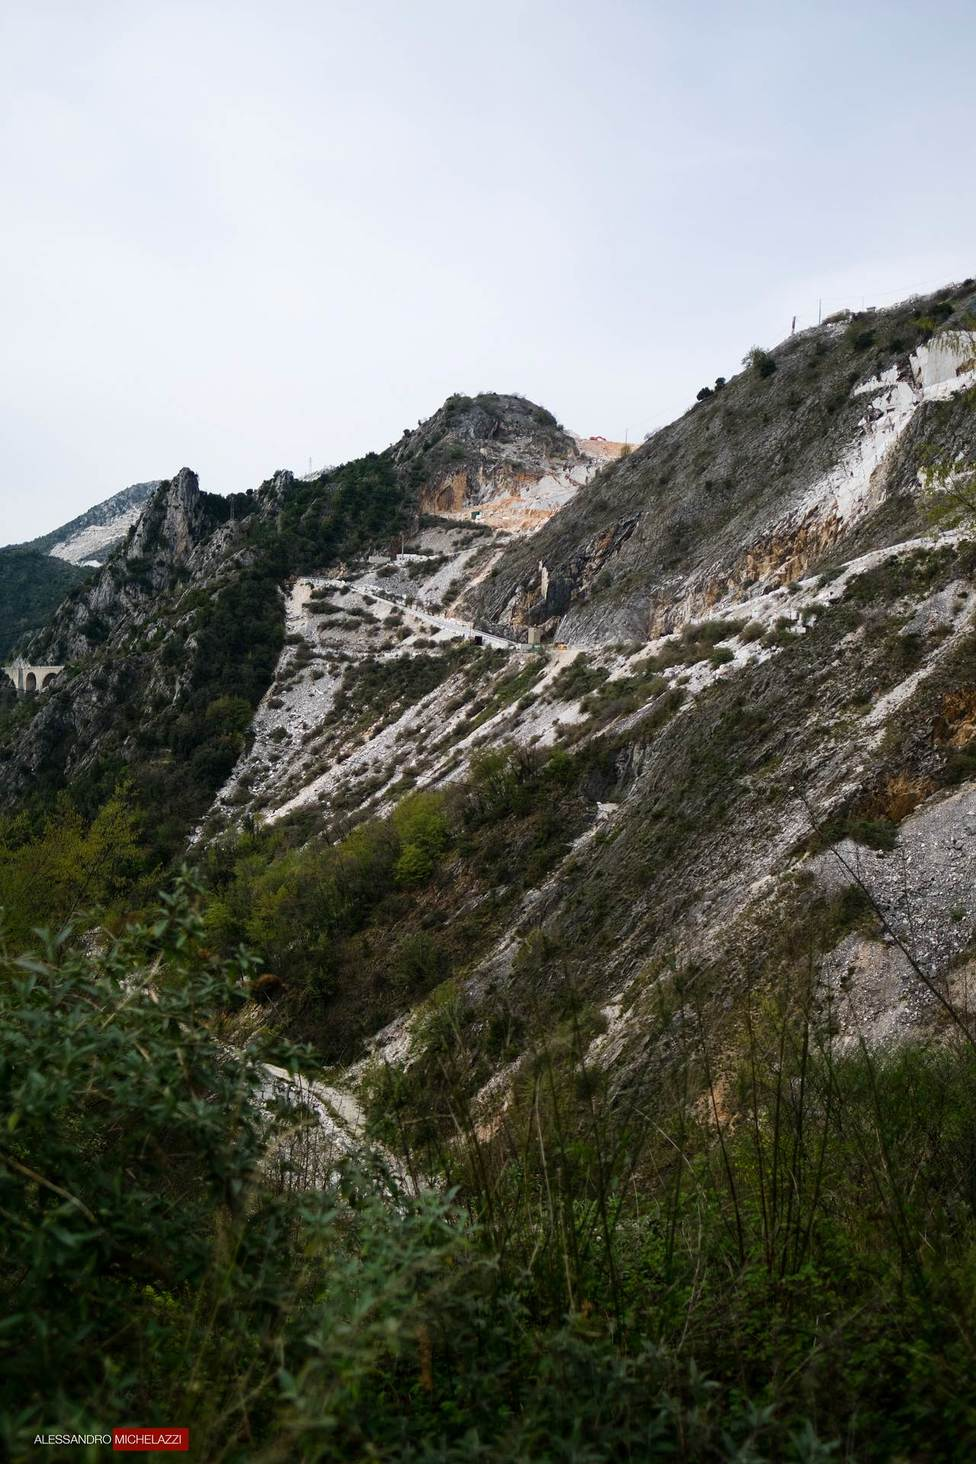 carrara-marble-cave-photos-1